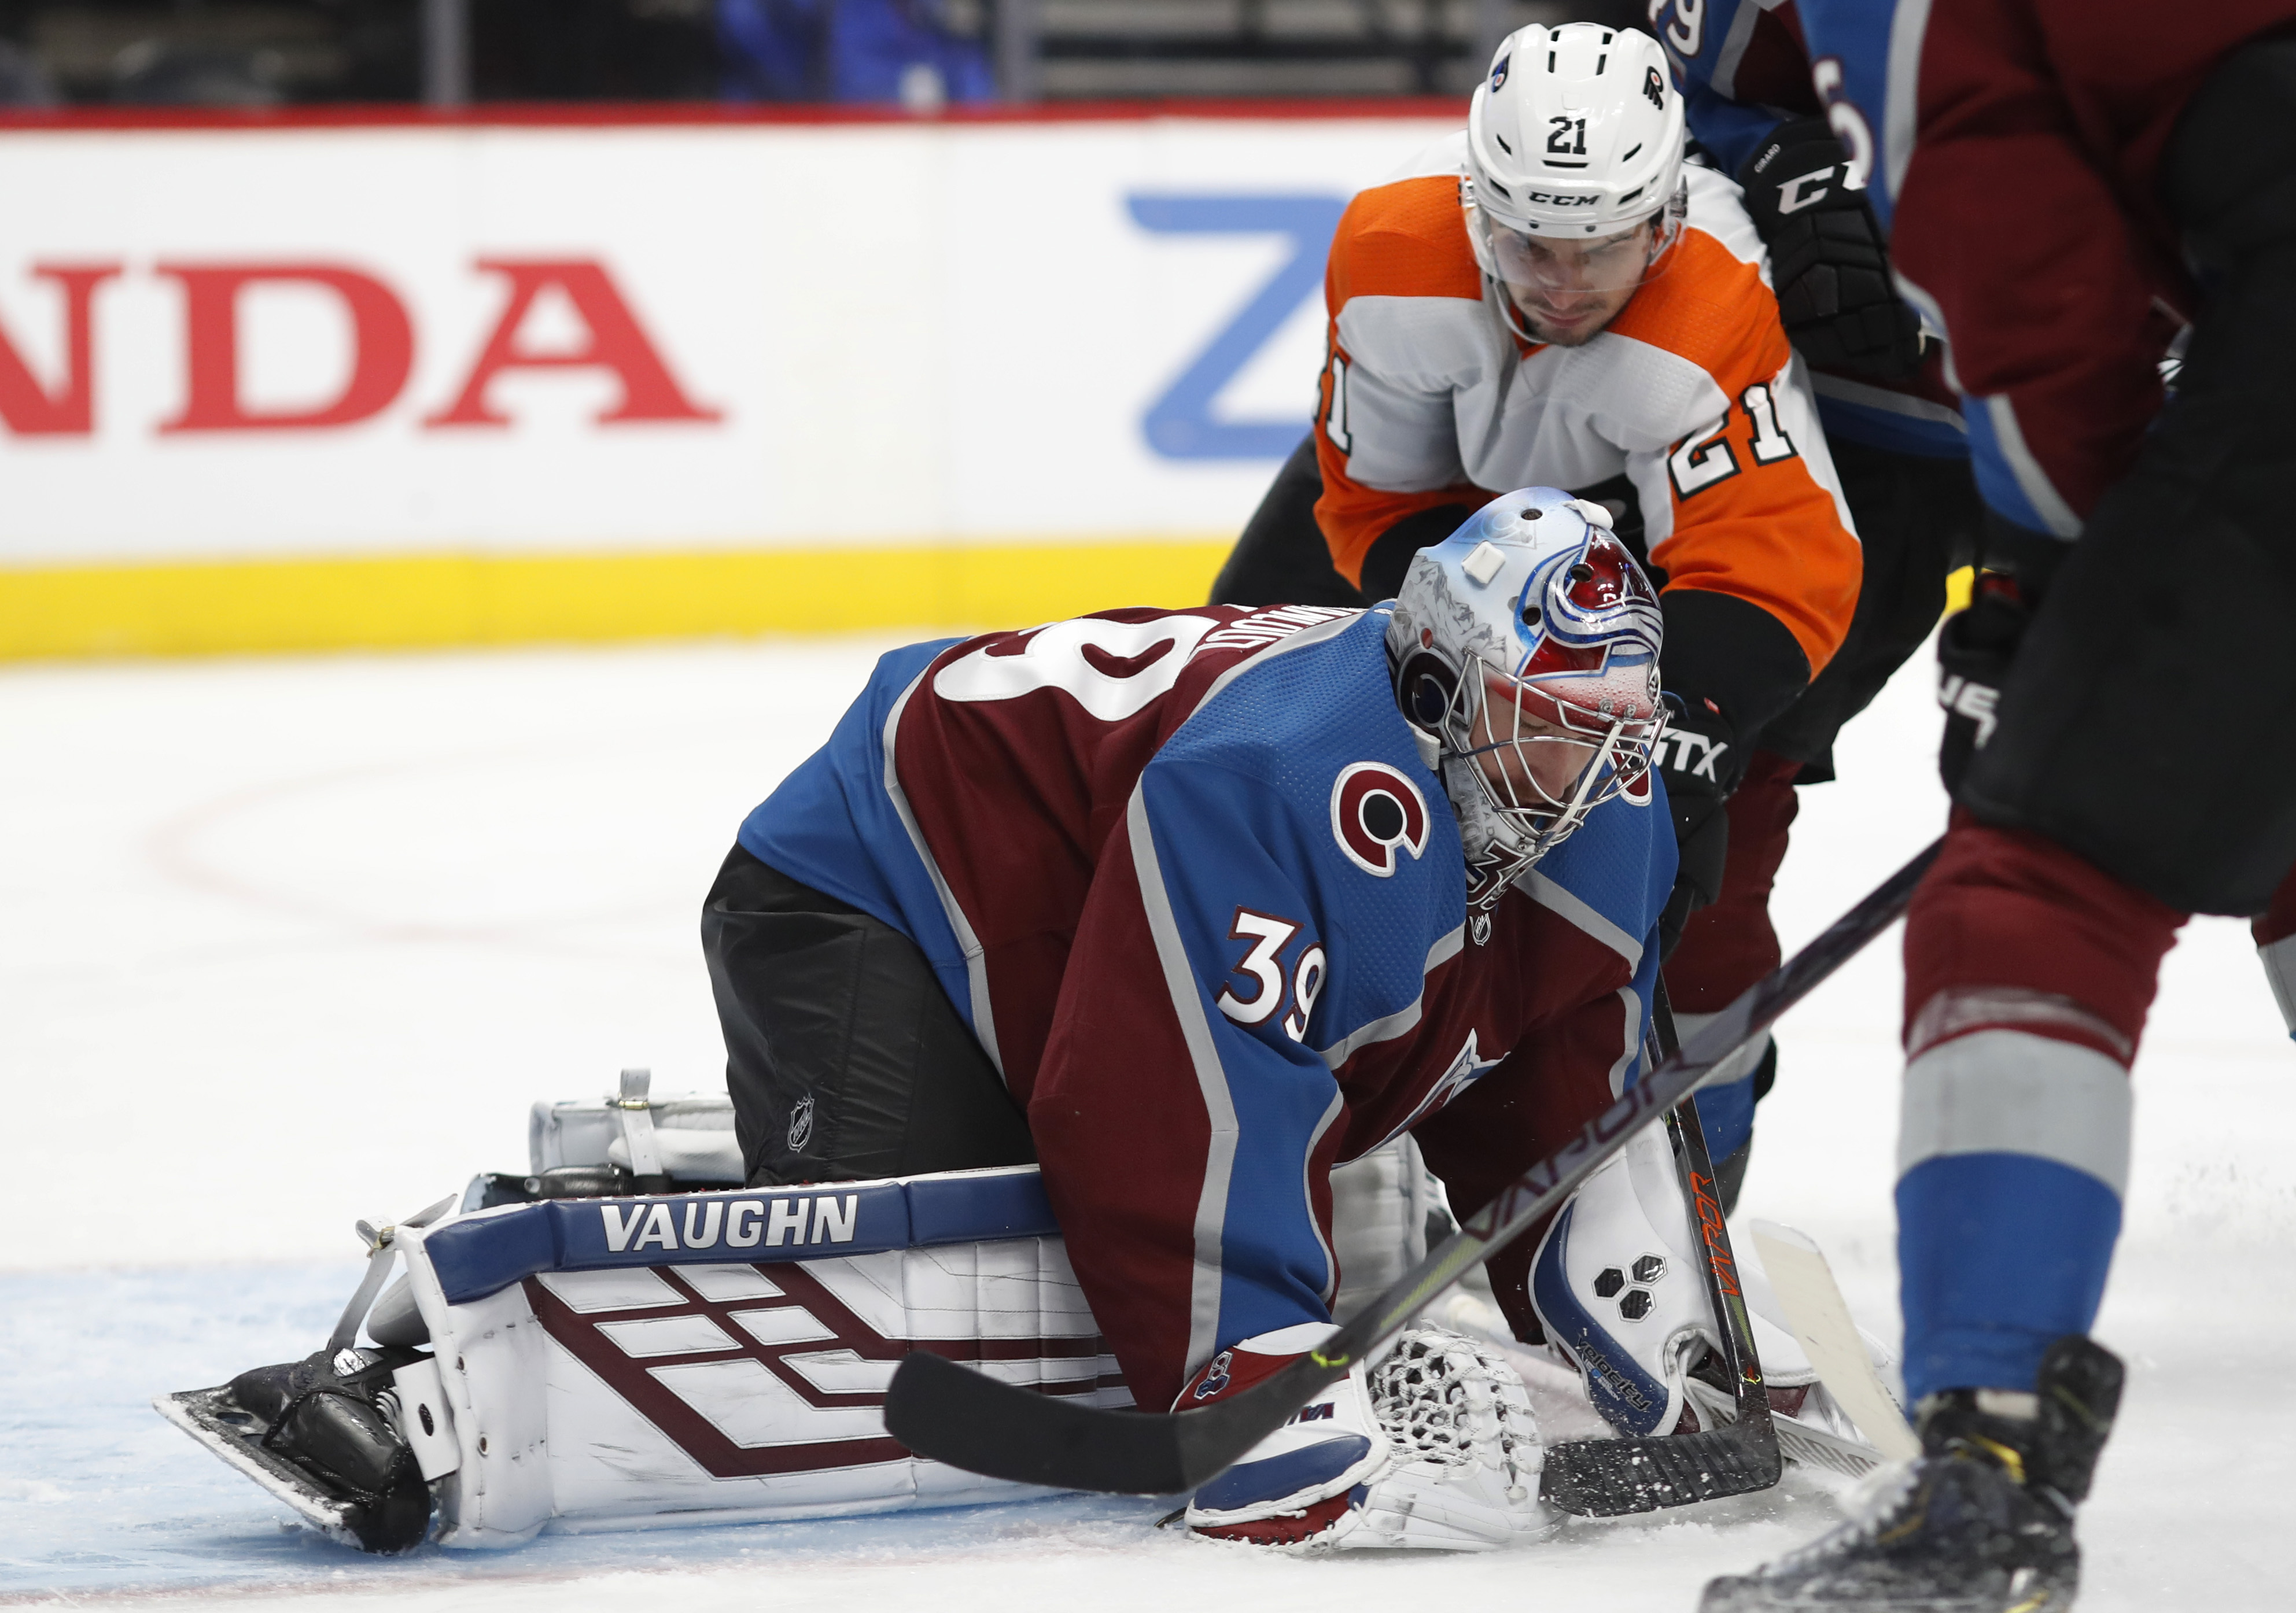 Rantanen scores twice, Avalanche beat Flyers 3-1